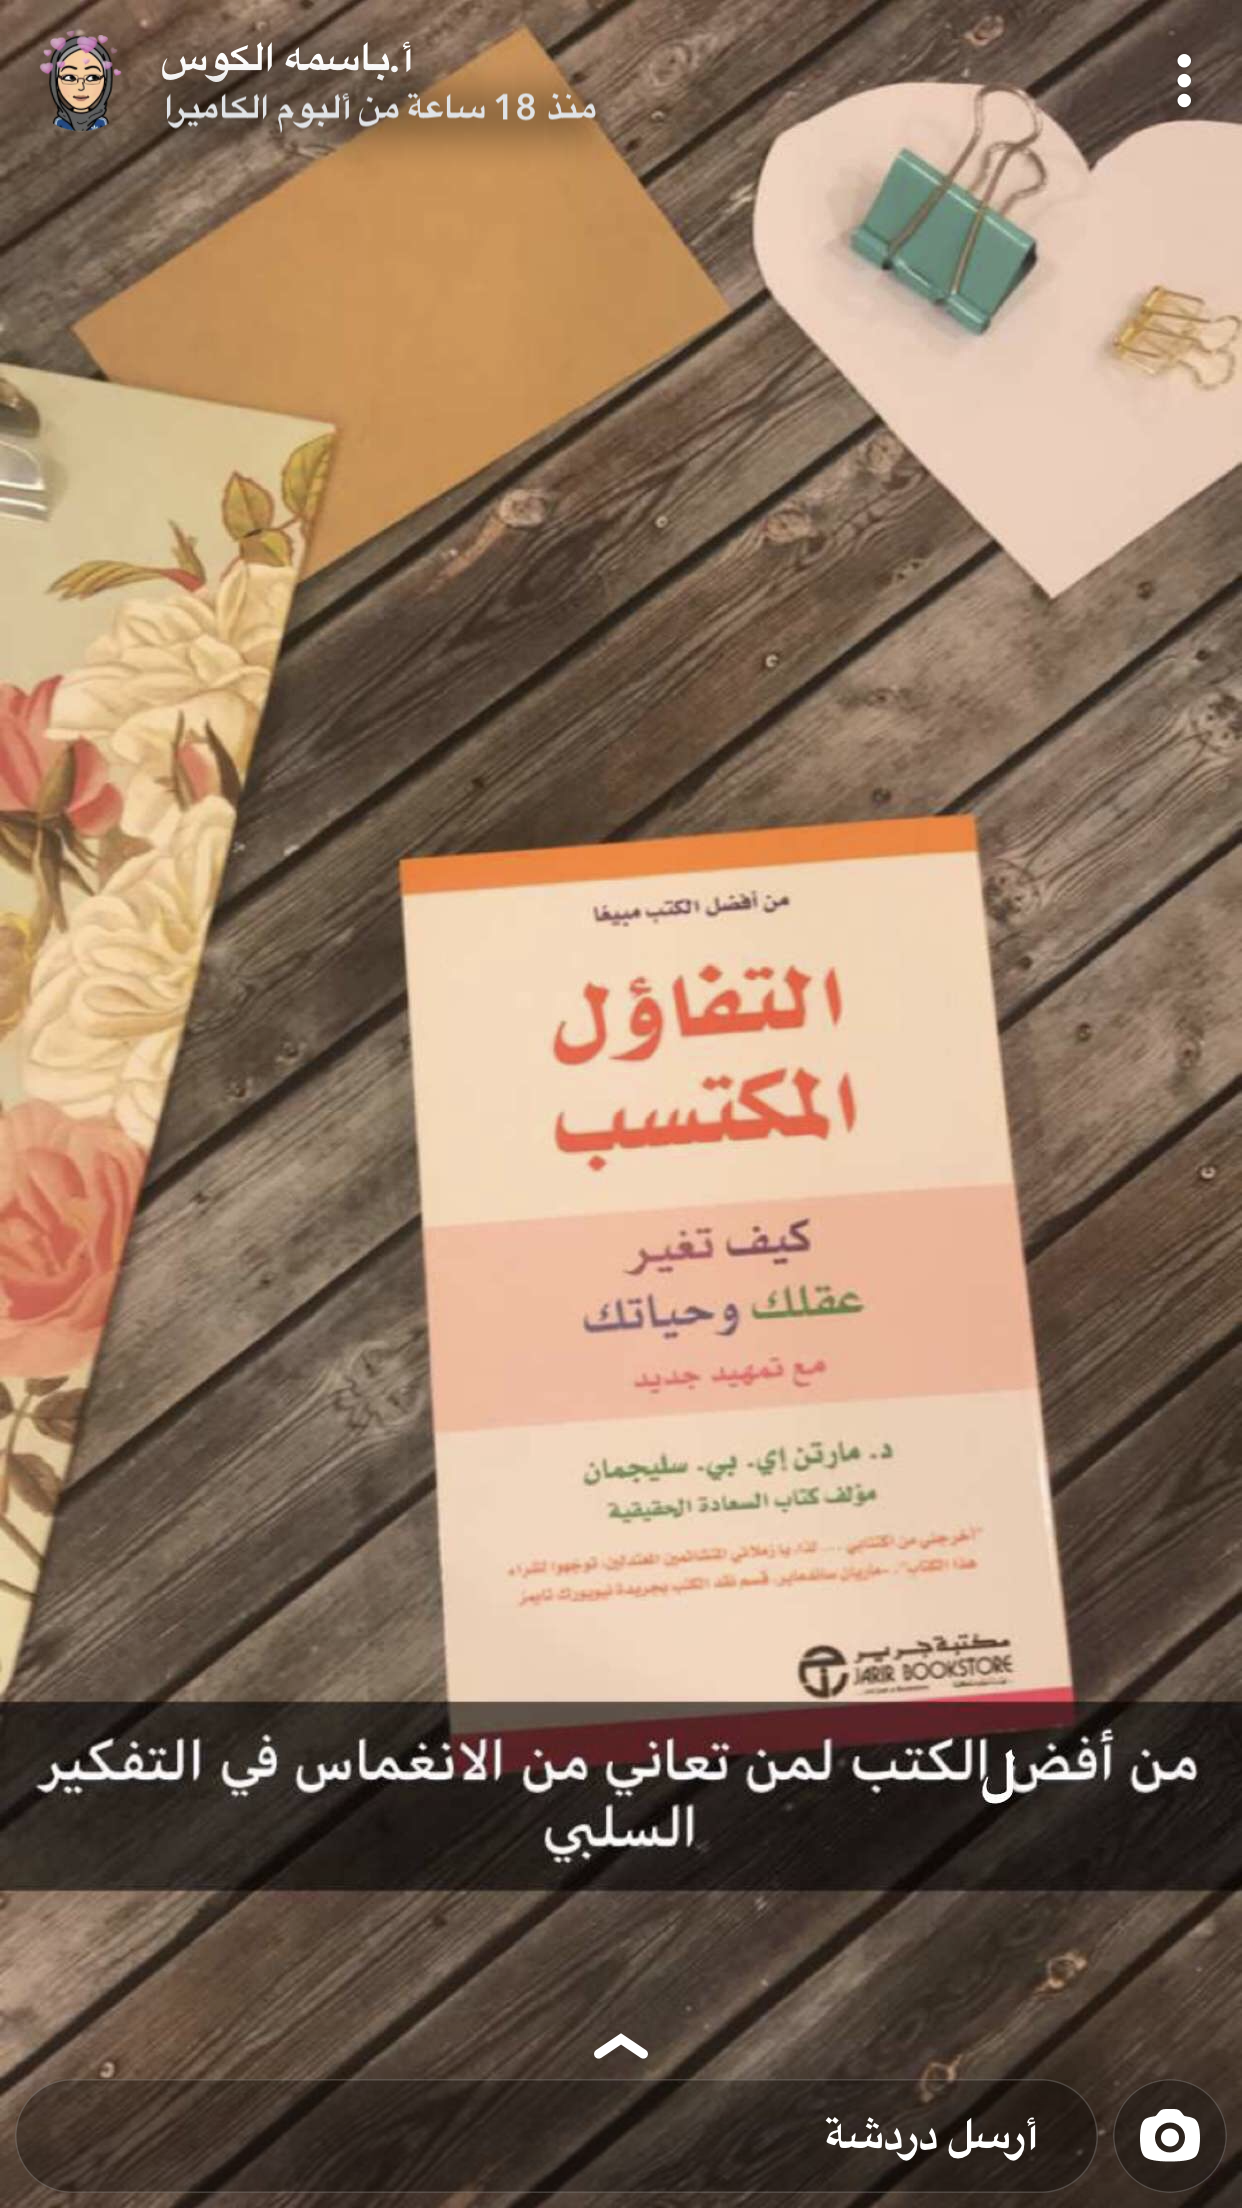 Pin By Reem On كتب Self Love Books Book Club Books Chapter Books